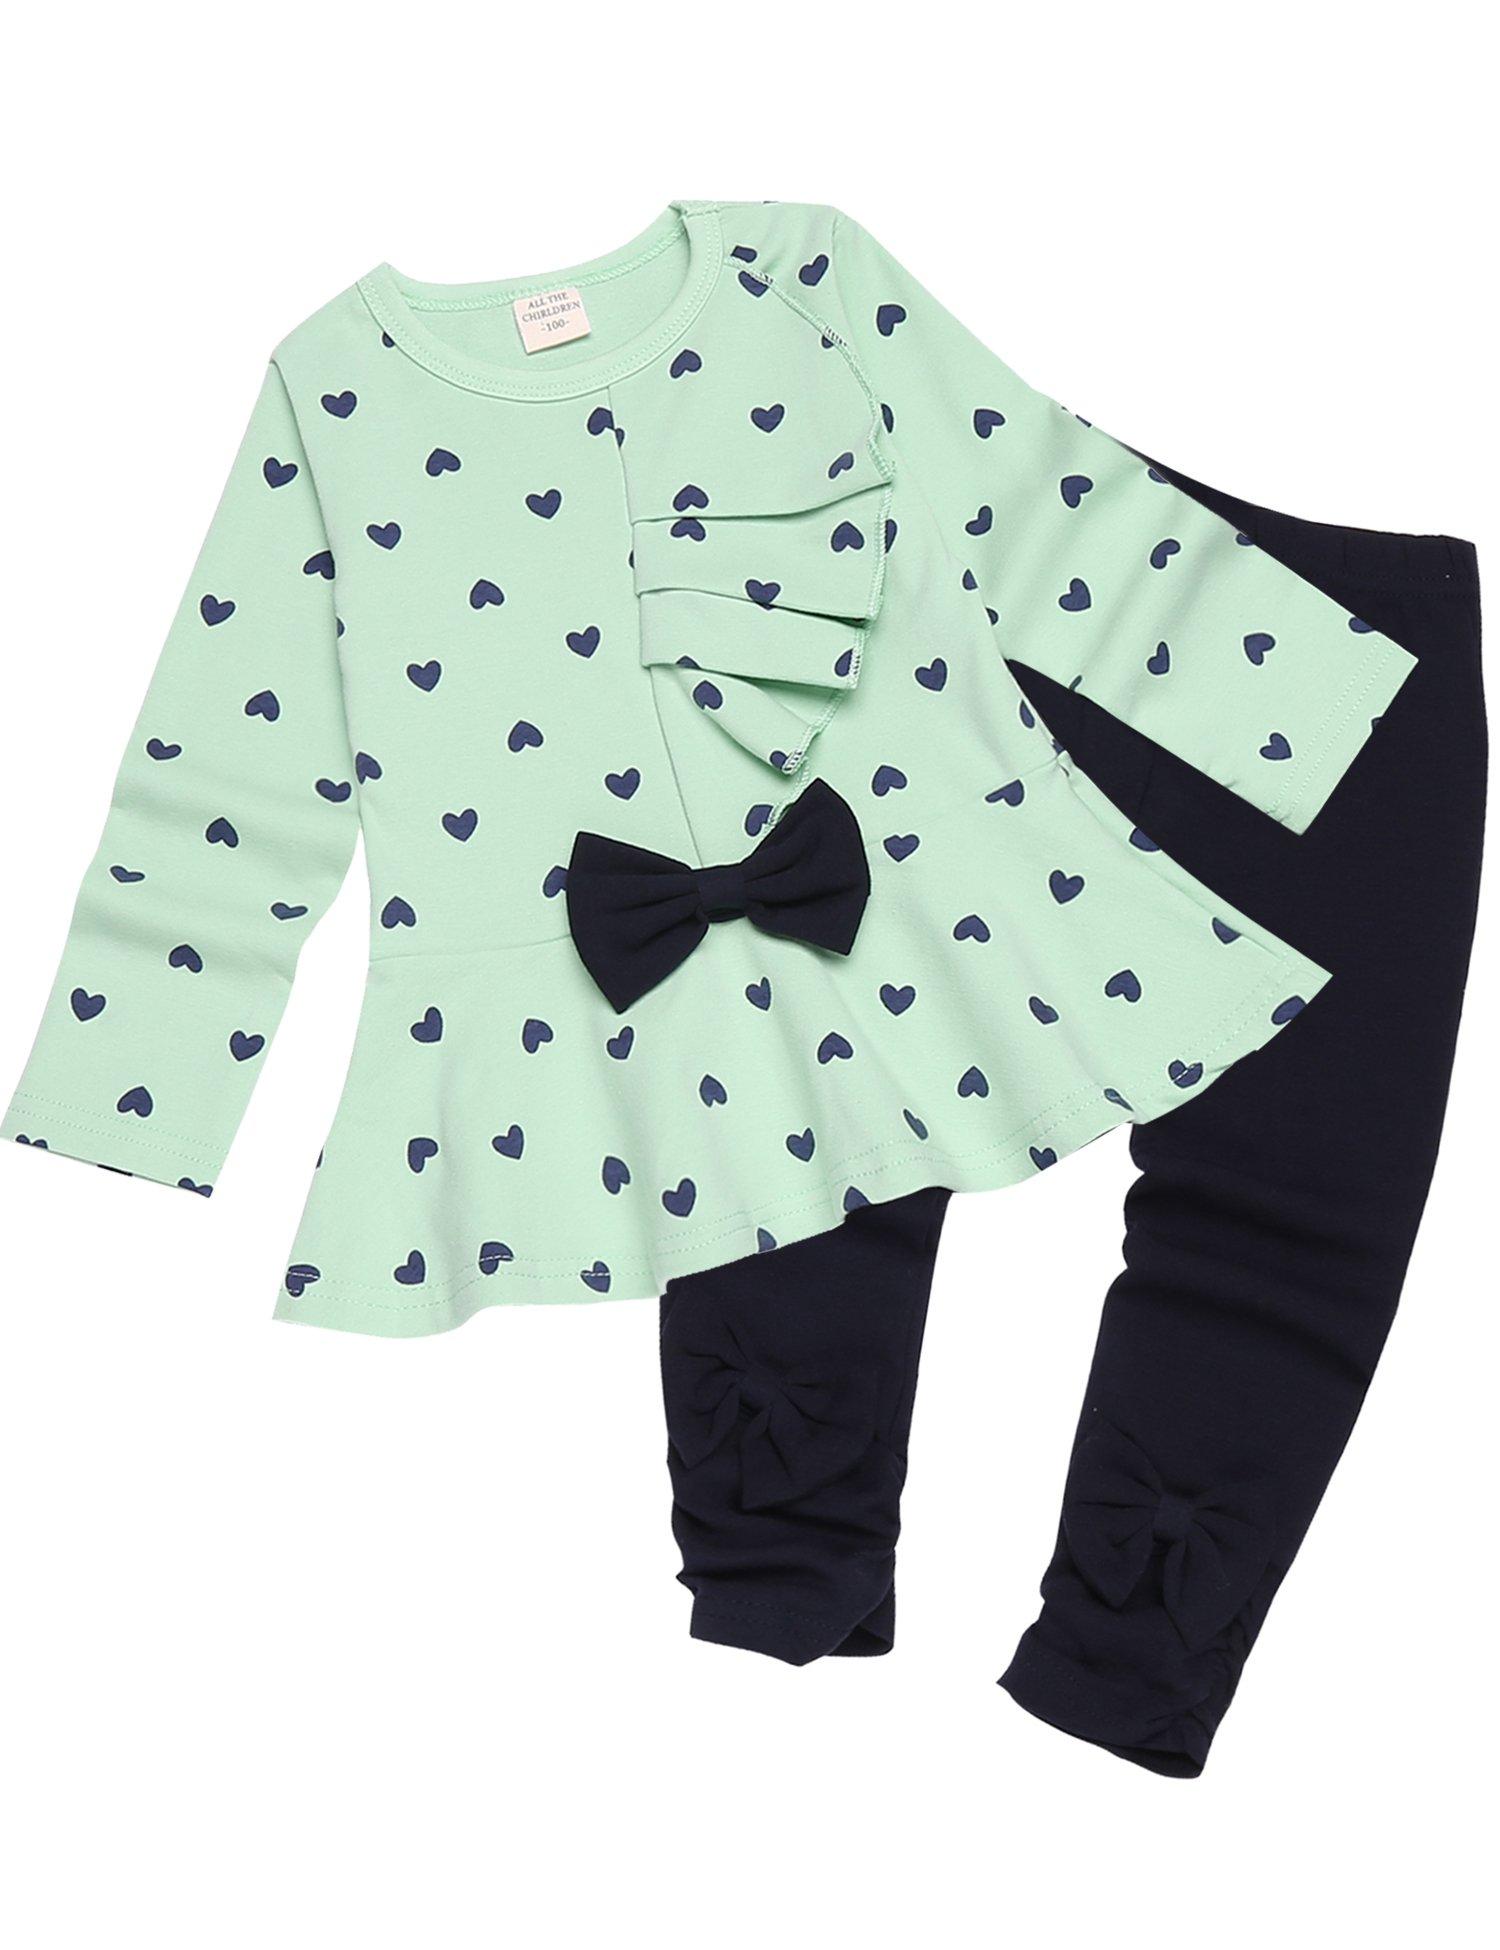 Zeagoo Baby Girls Pjs Sets Kids Cute 2pcs Outfits Toddler PJS Cotton Pajamas for Girls